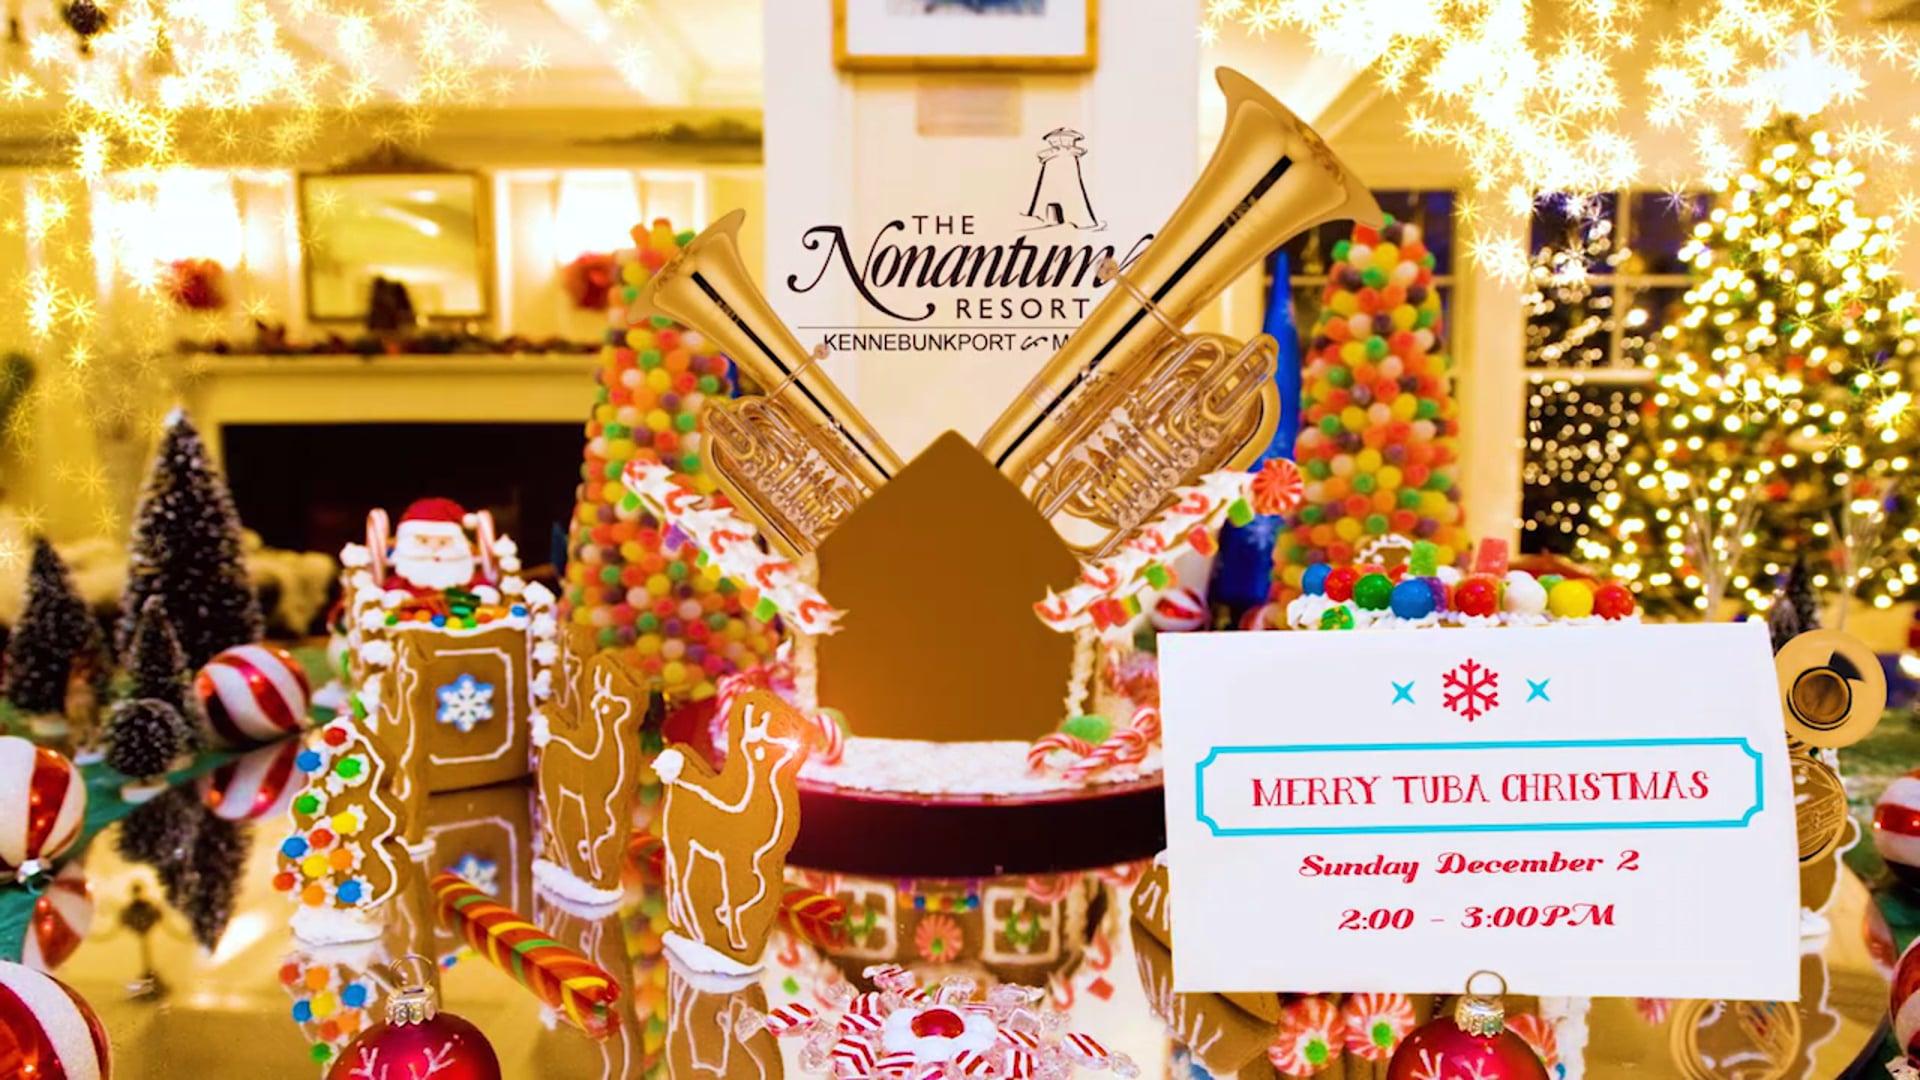 Facebook Ad - Nonantum Resort - Tuba Christmas and Gingerbread House